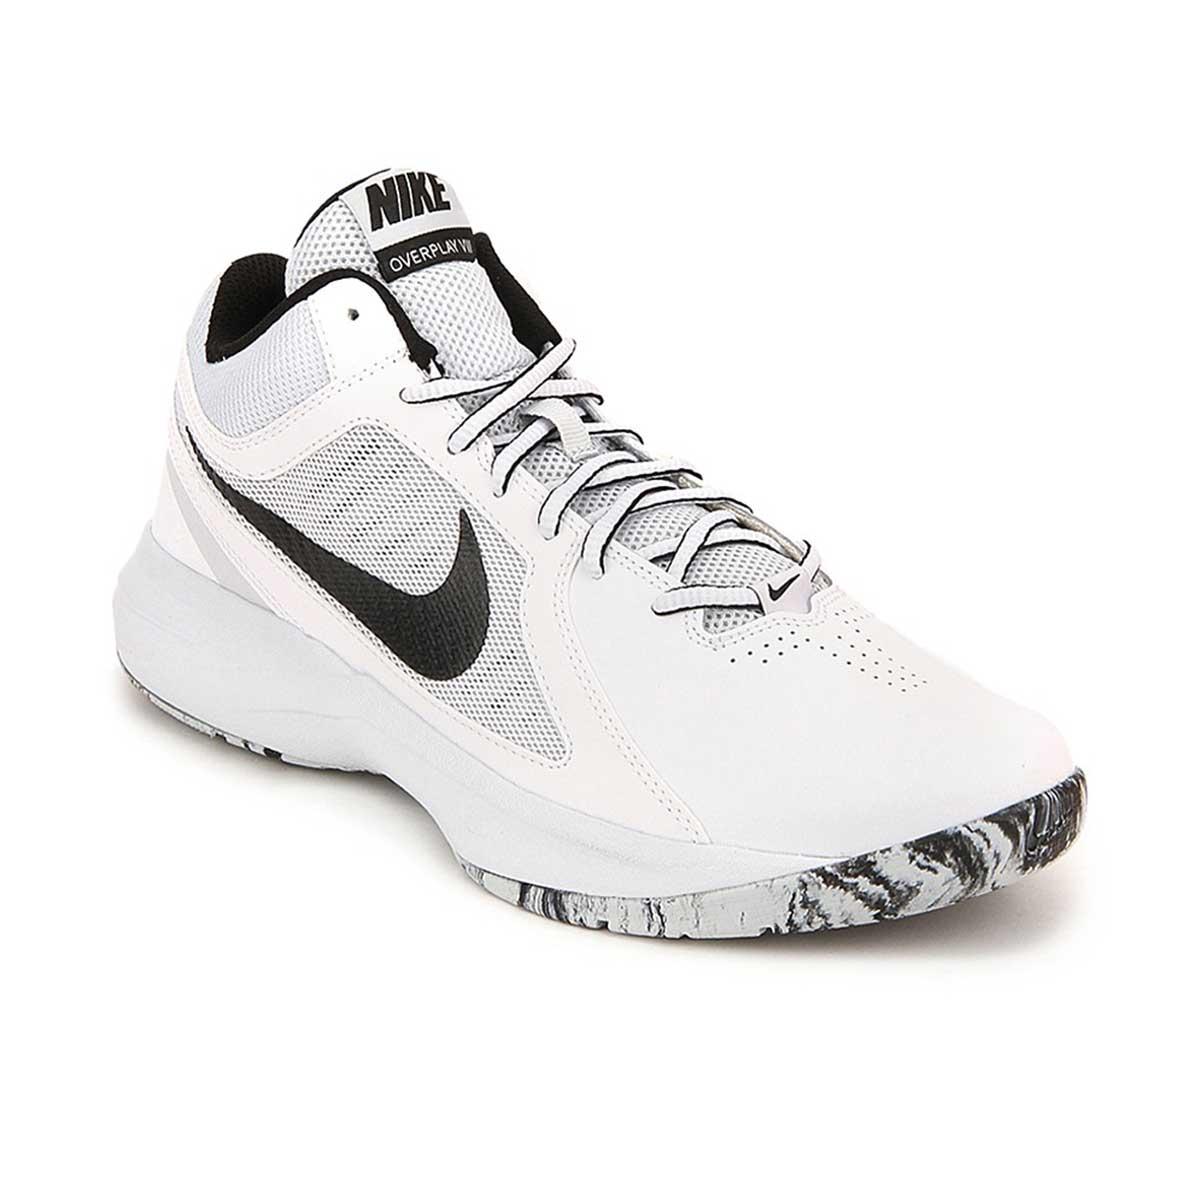 Basketball Shoes, Basketball, Sports, Buy, Nike, Nike Overplay VIII  Basketball Shoes